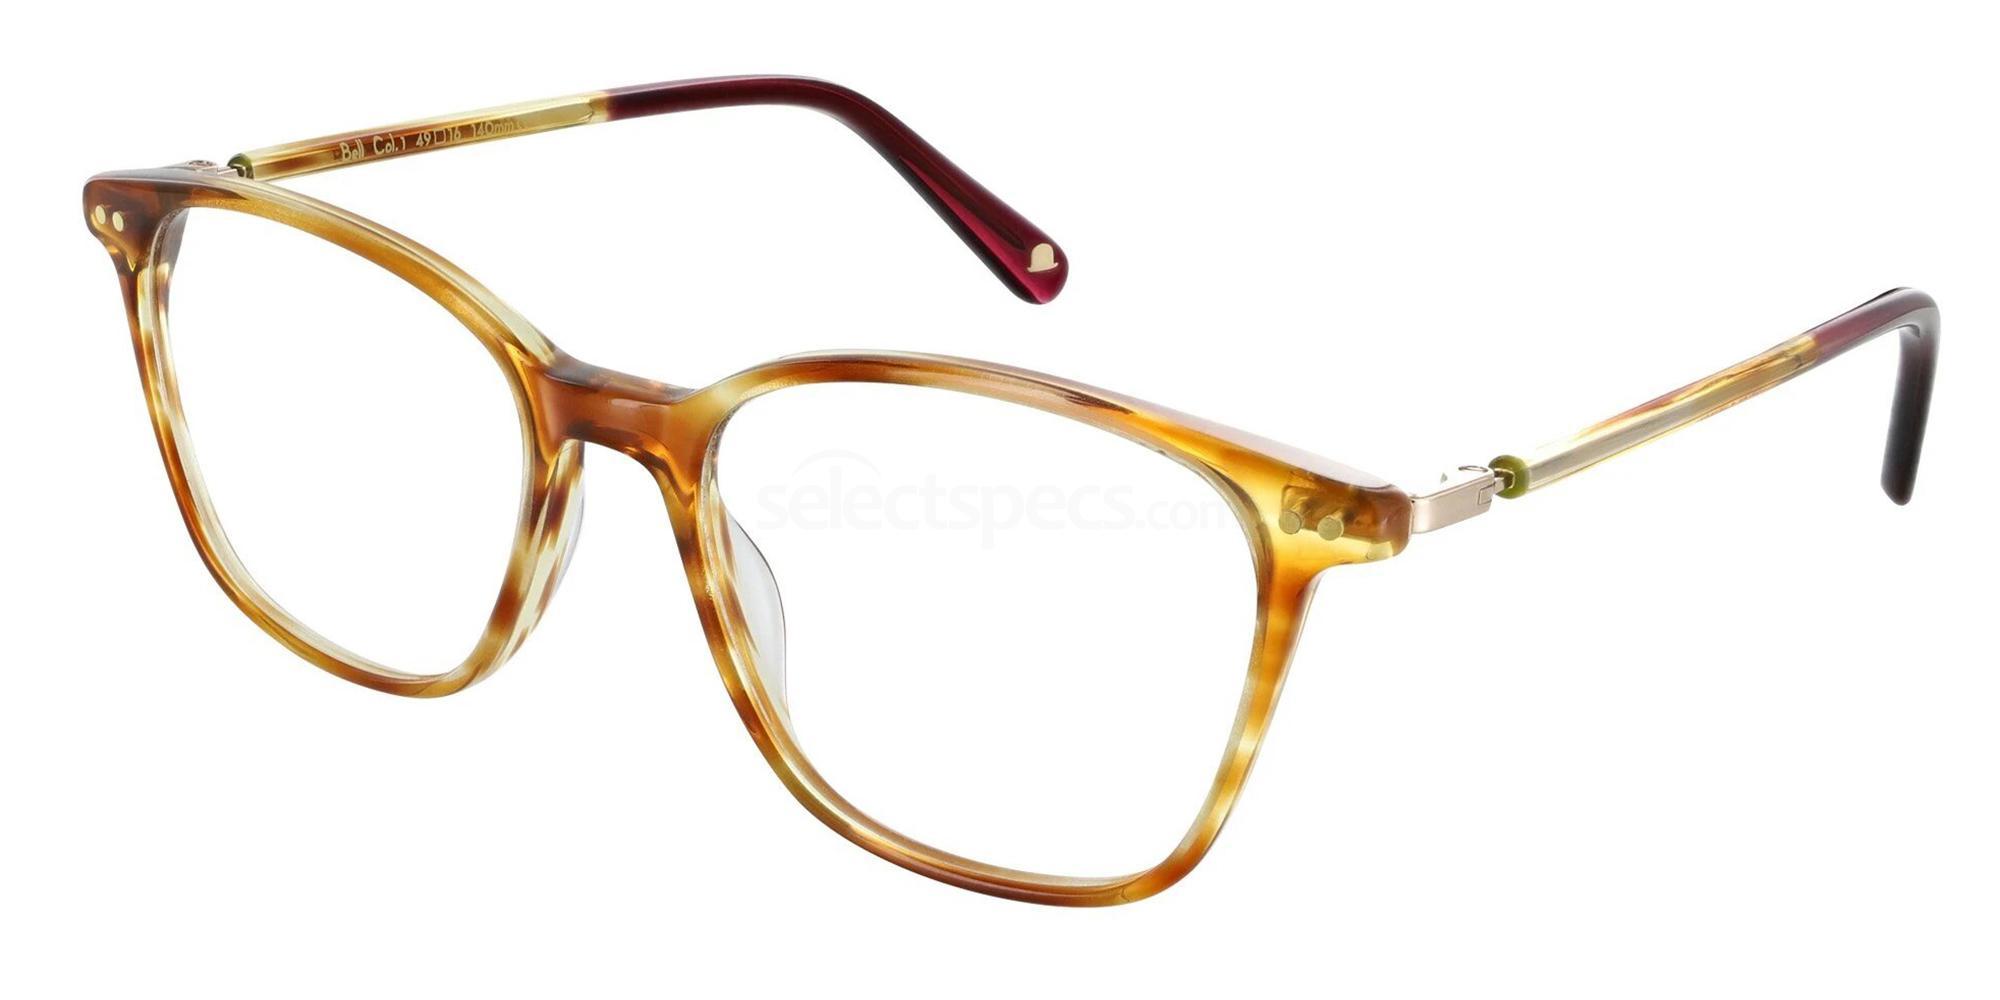 C1 BELL Glasses, Walter and Herbert